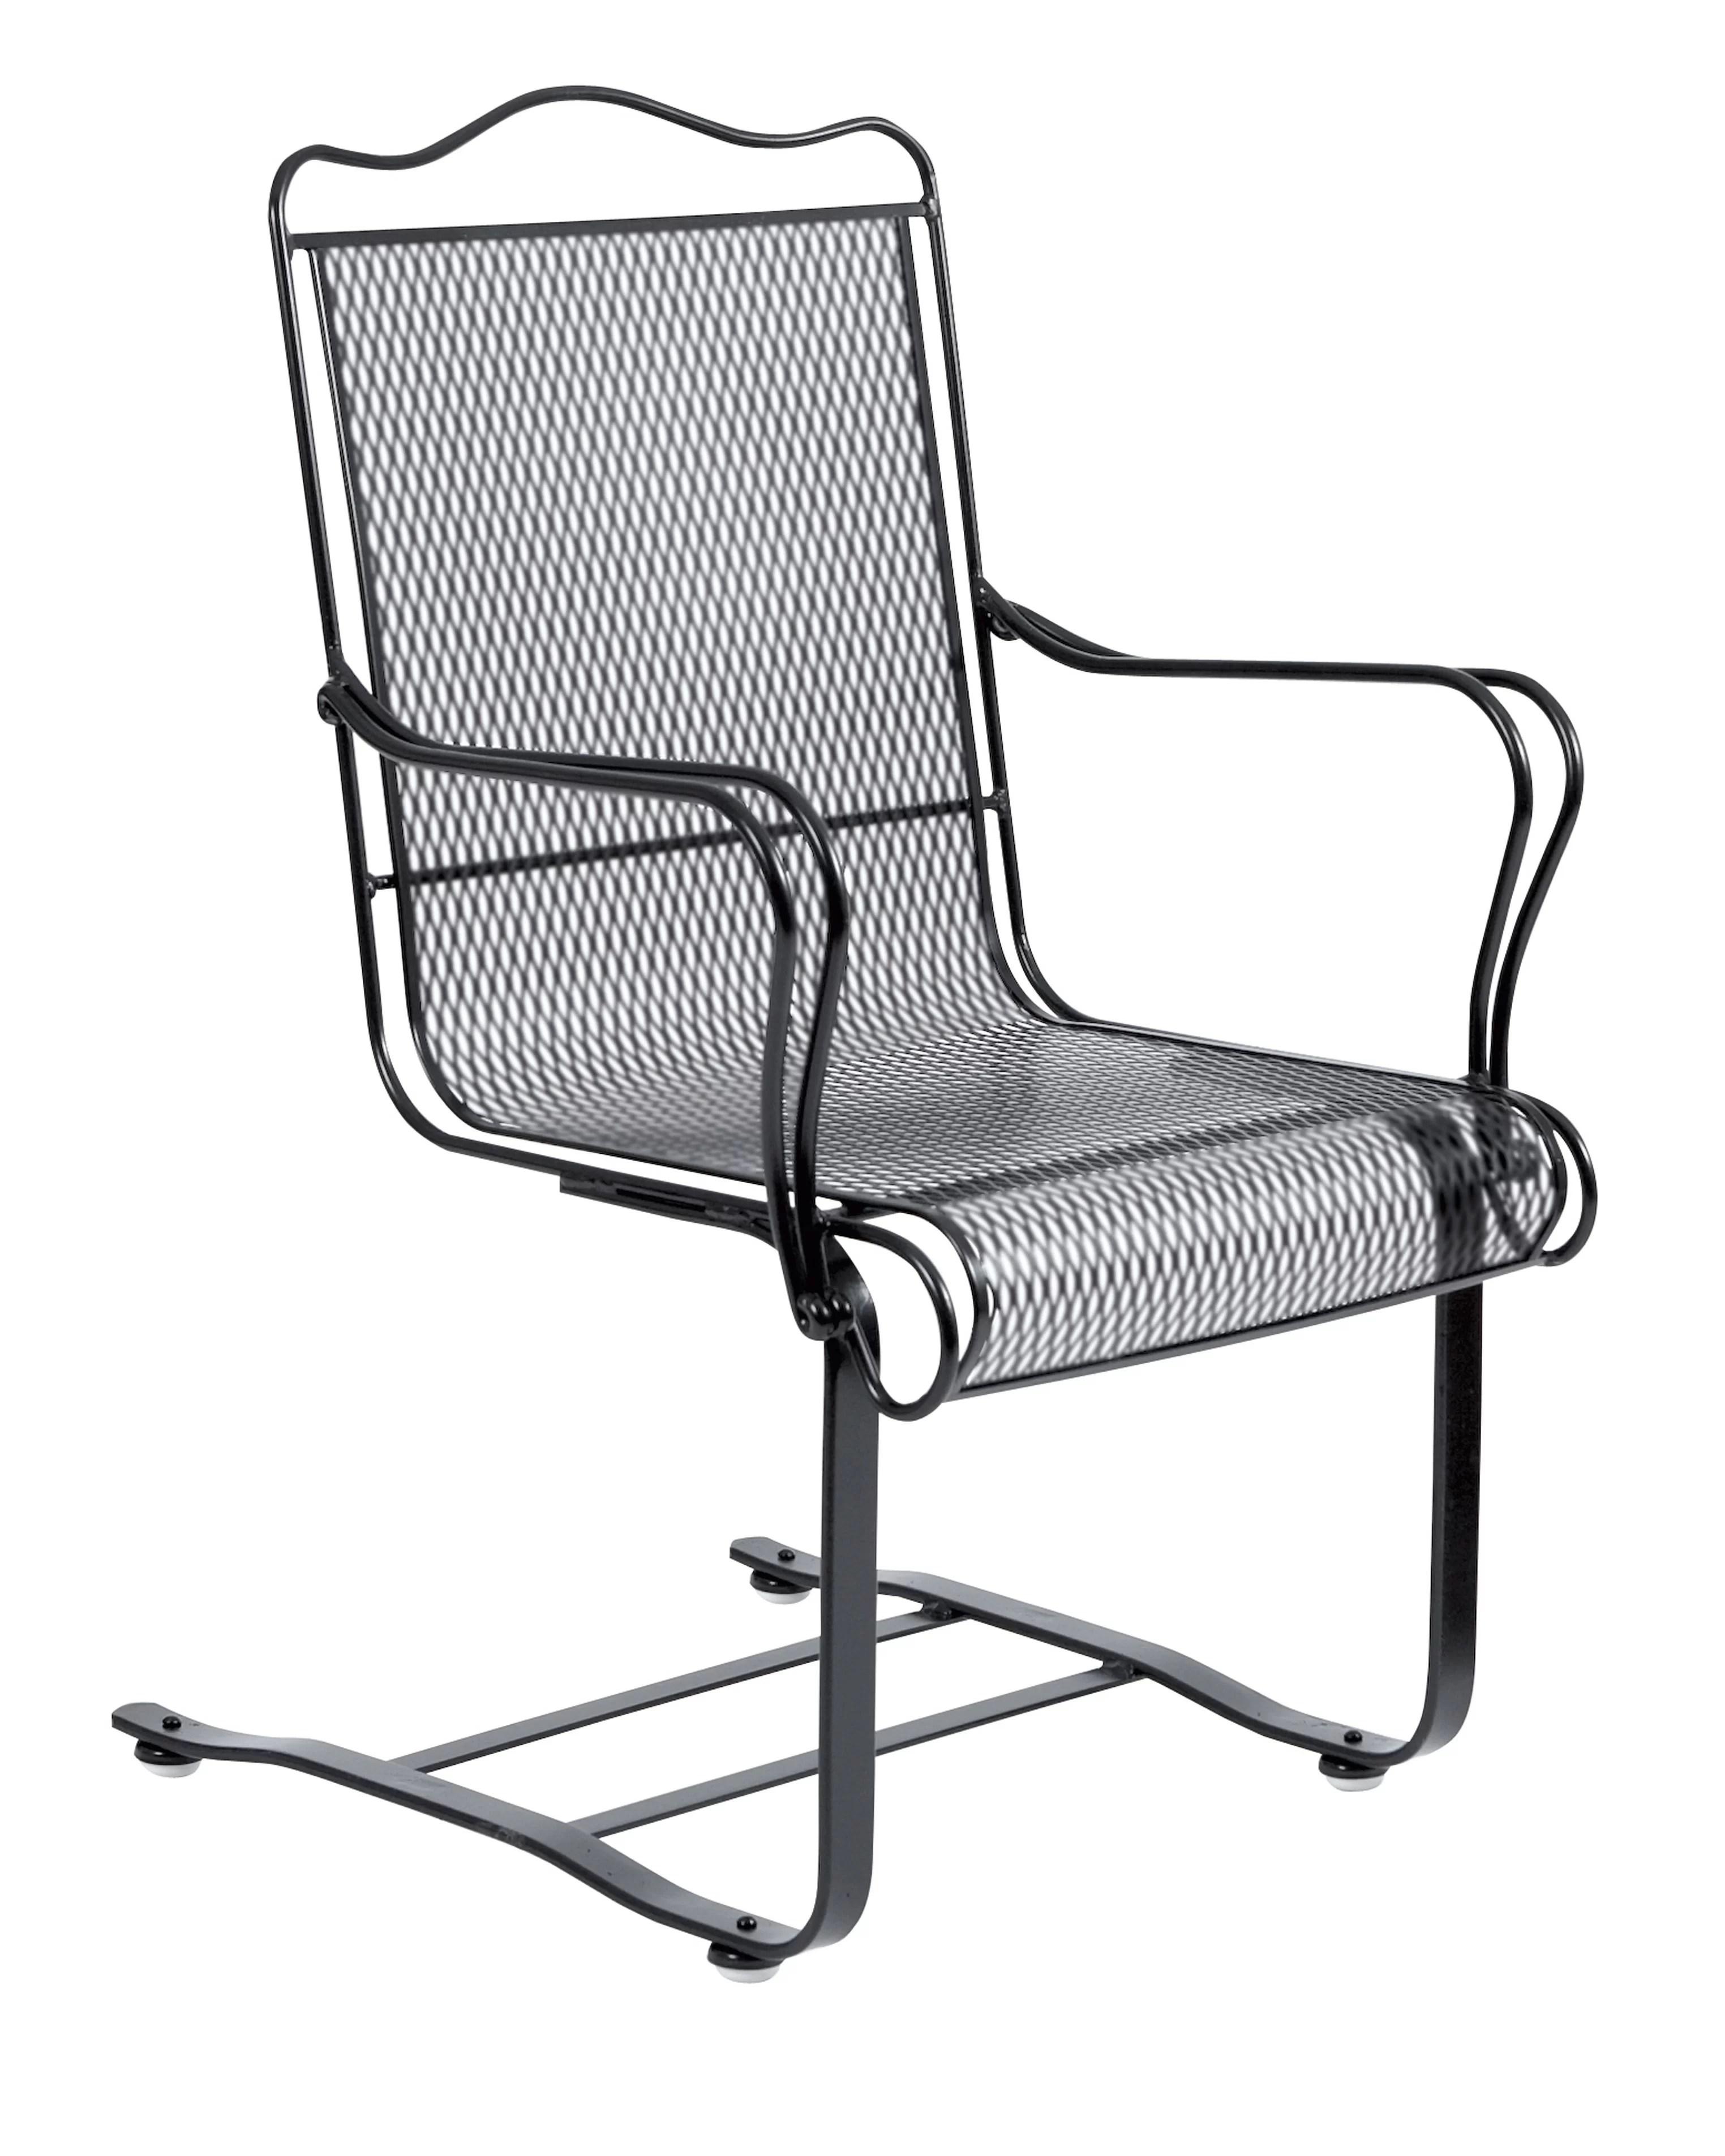 tucson high back spring base patio chair